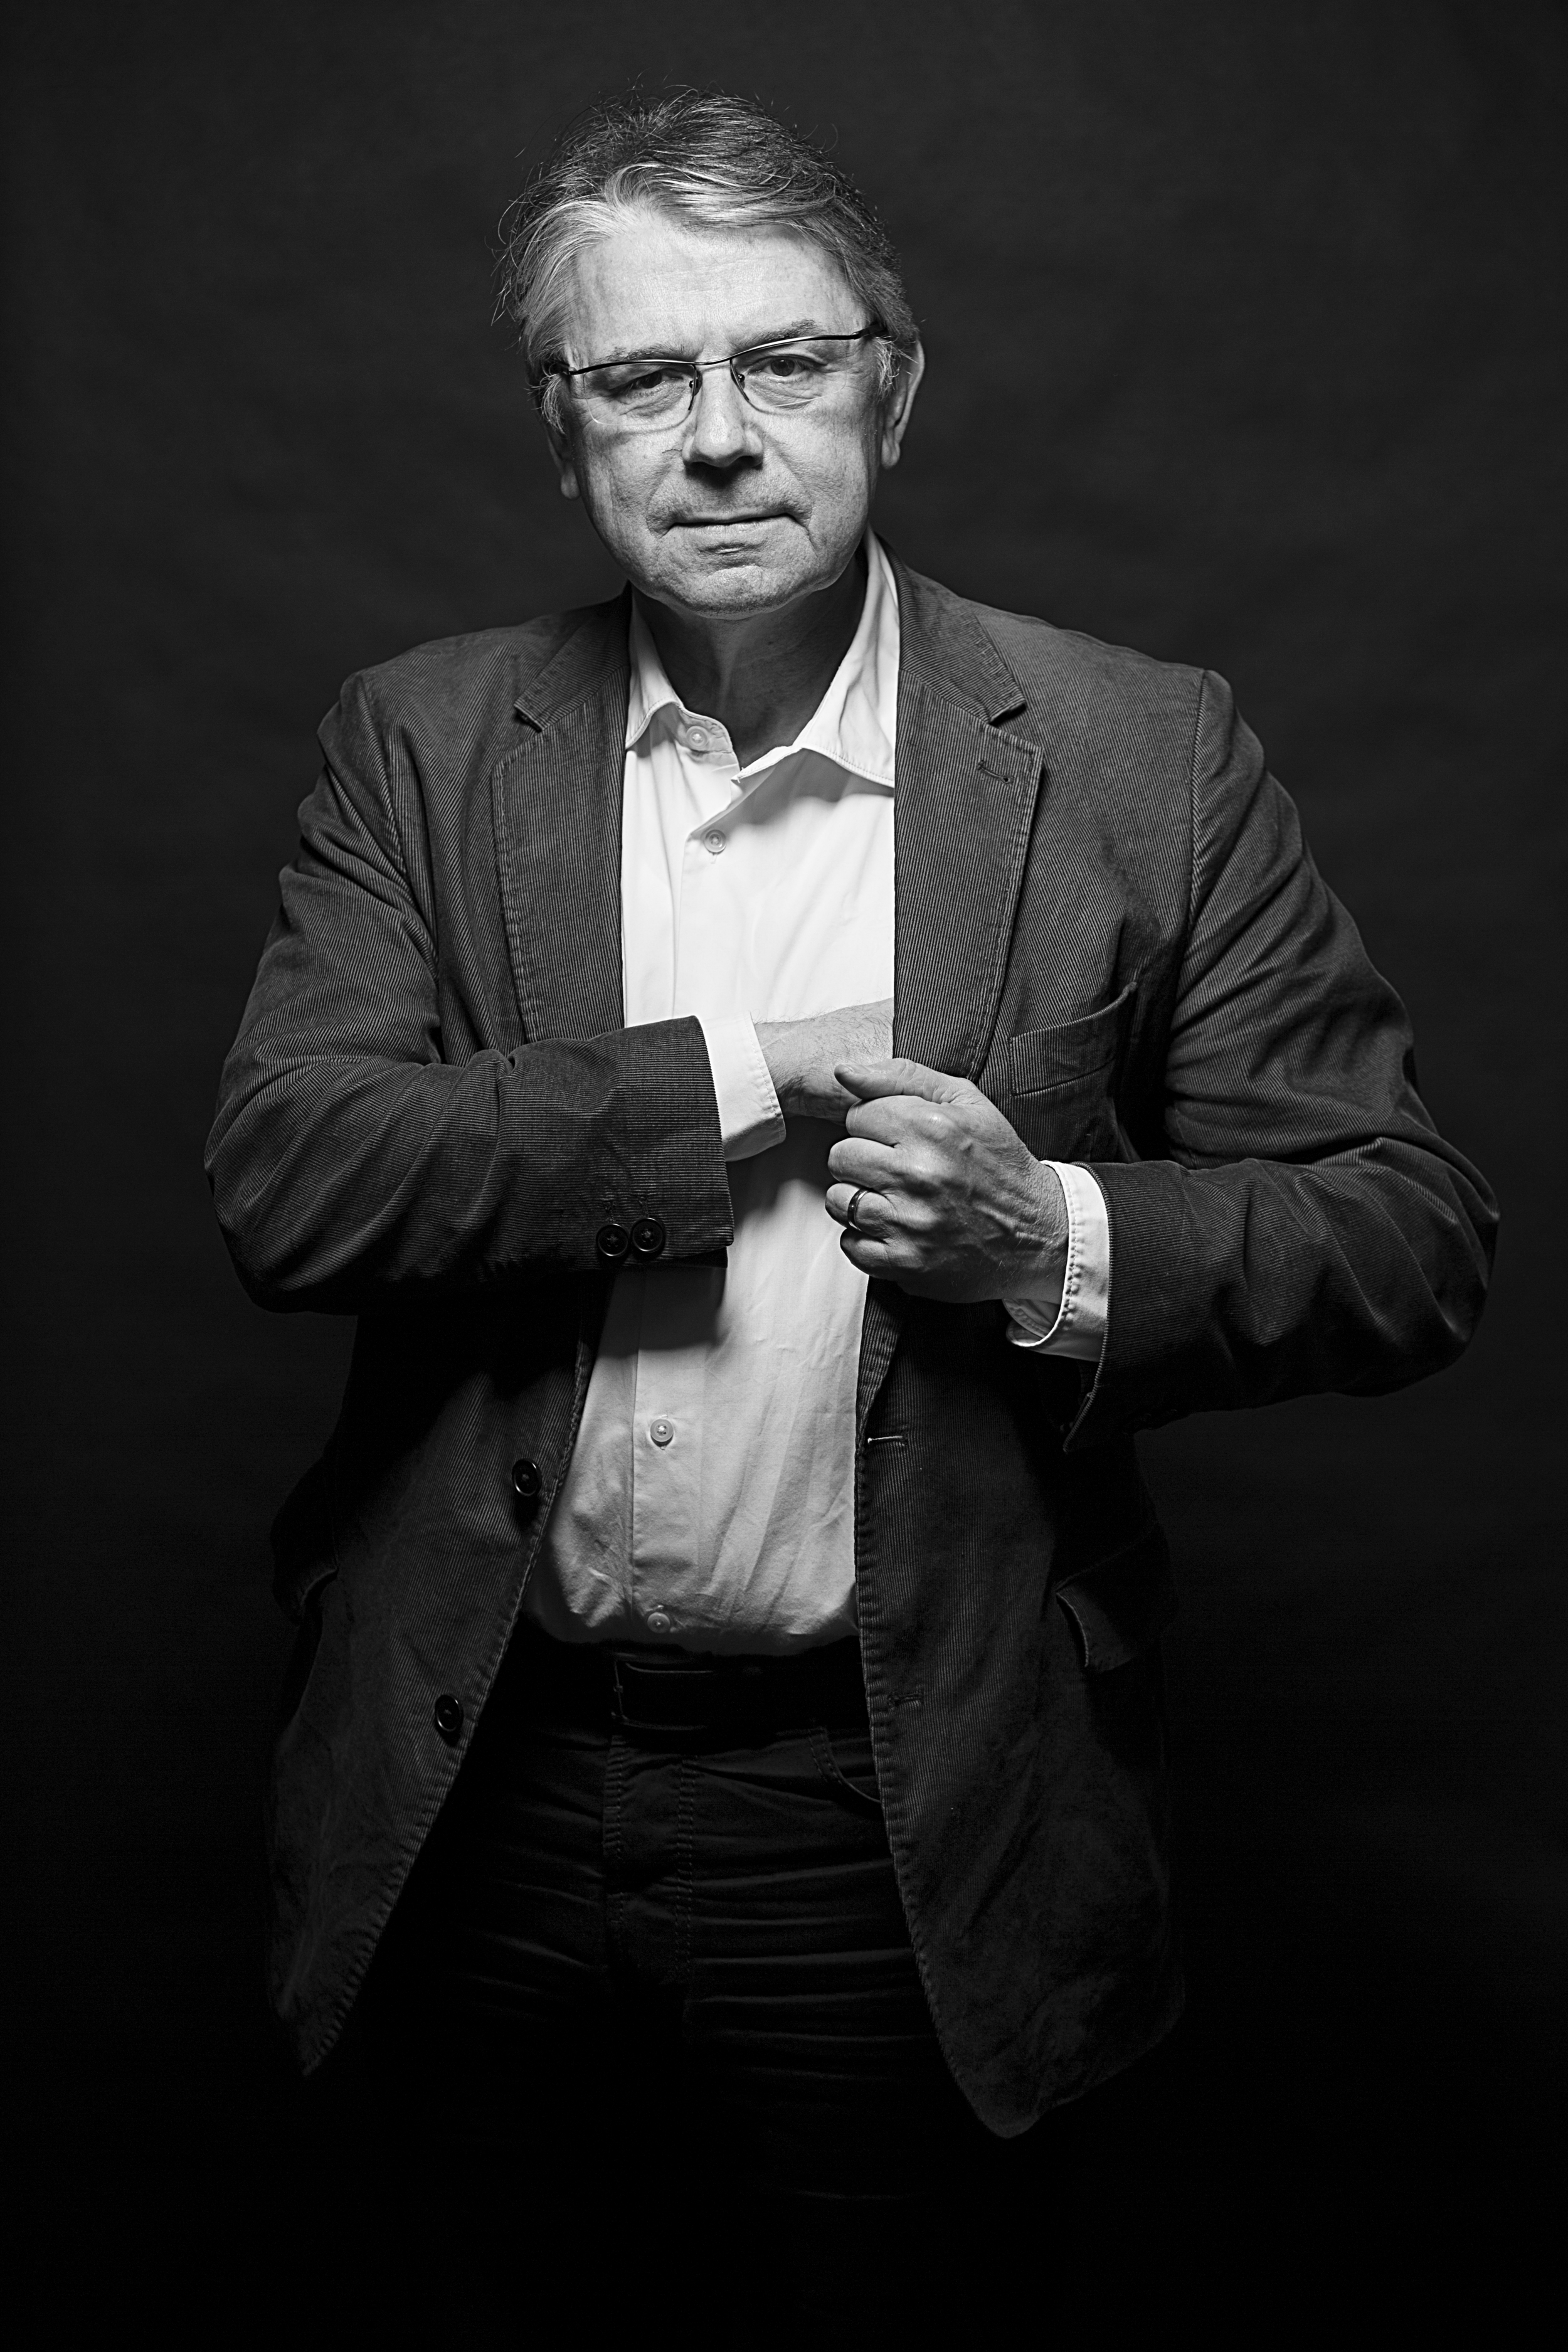 Ulrich Khuon